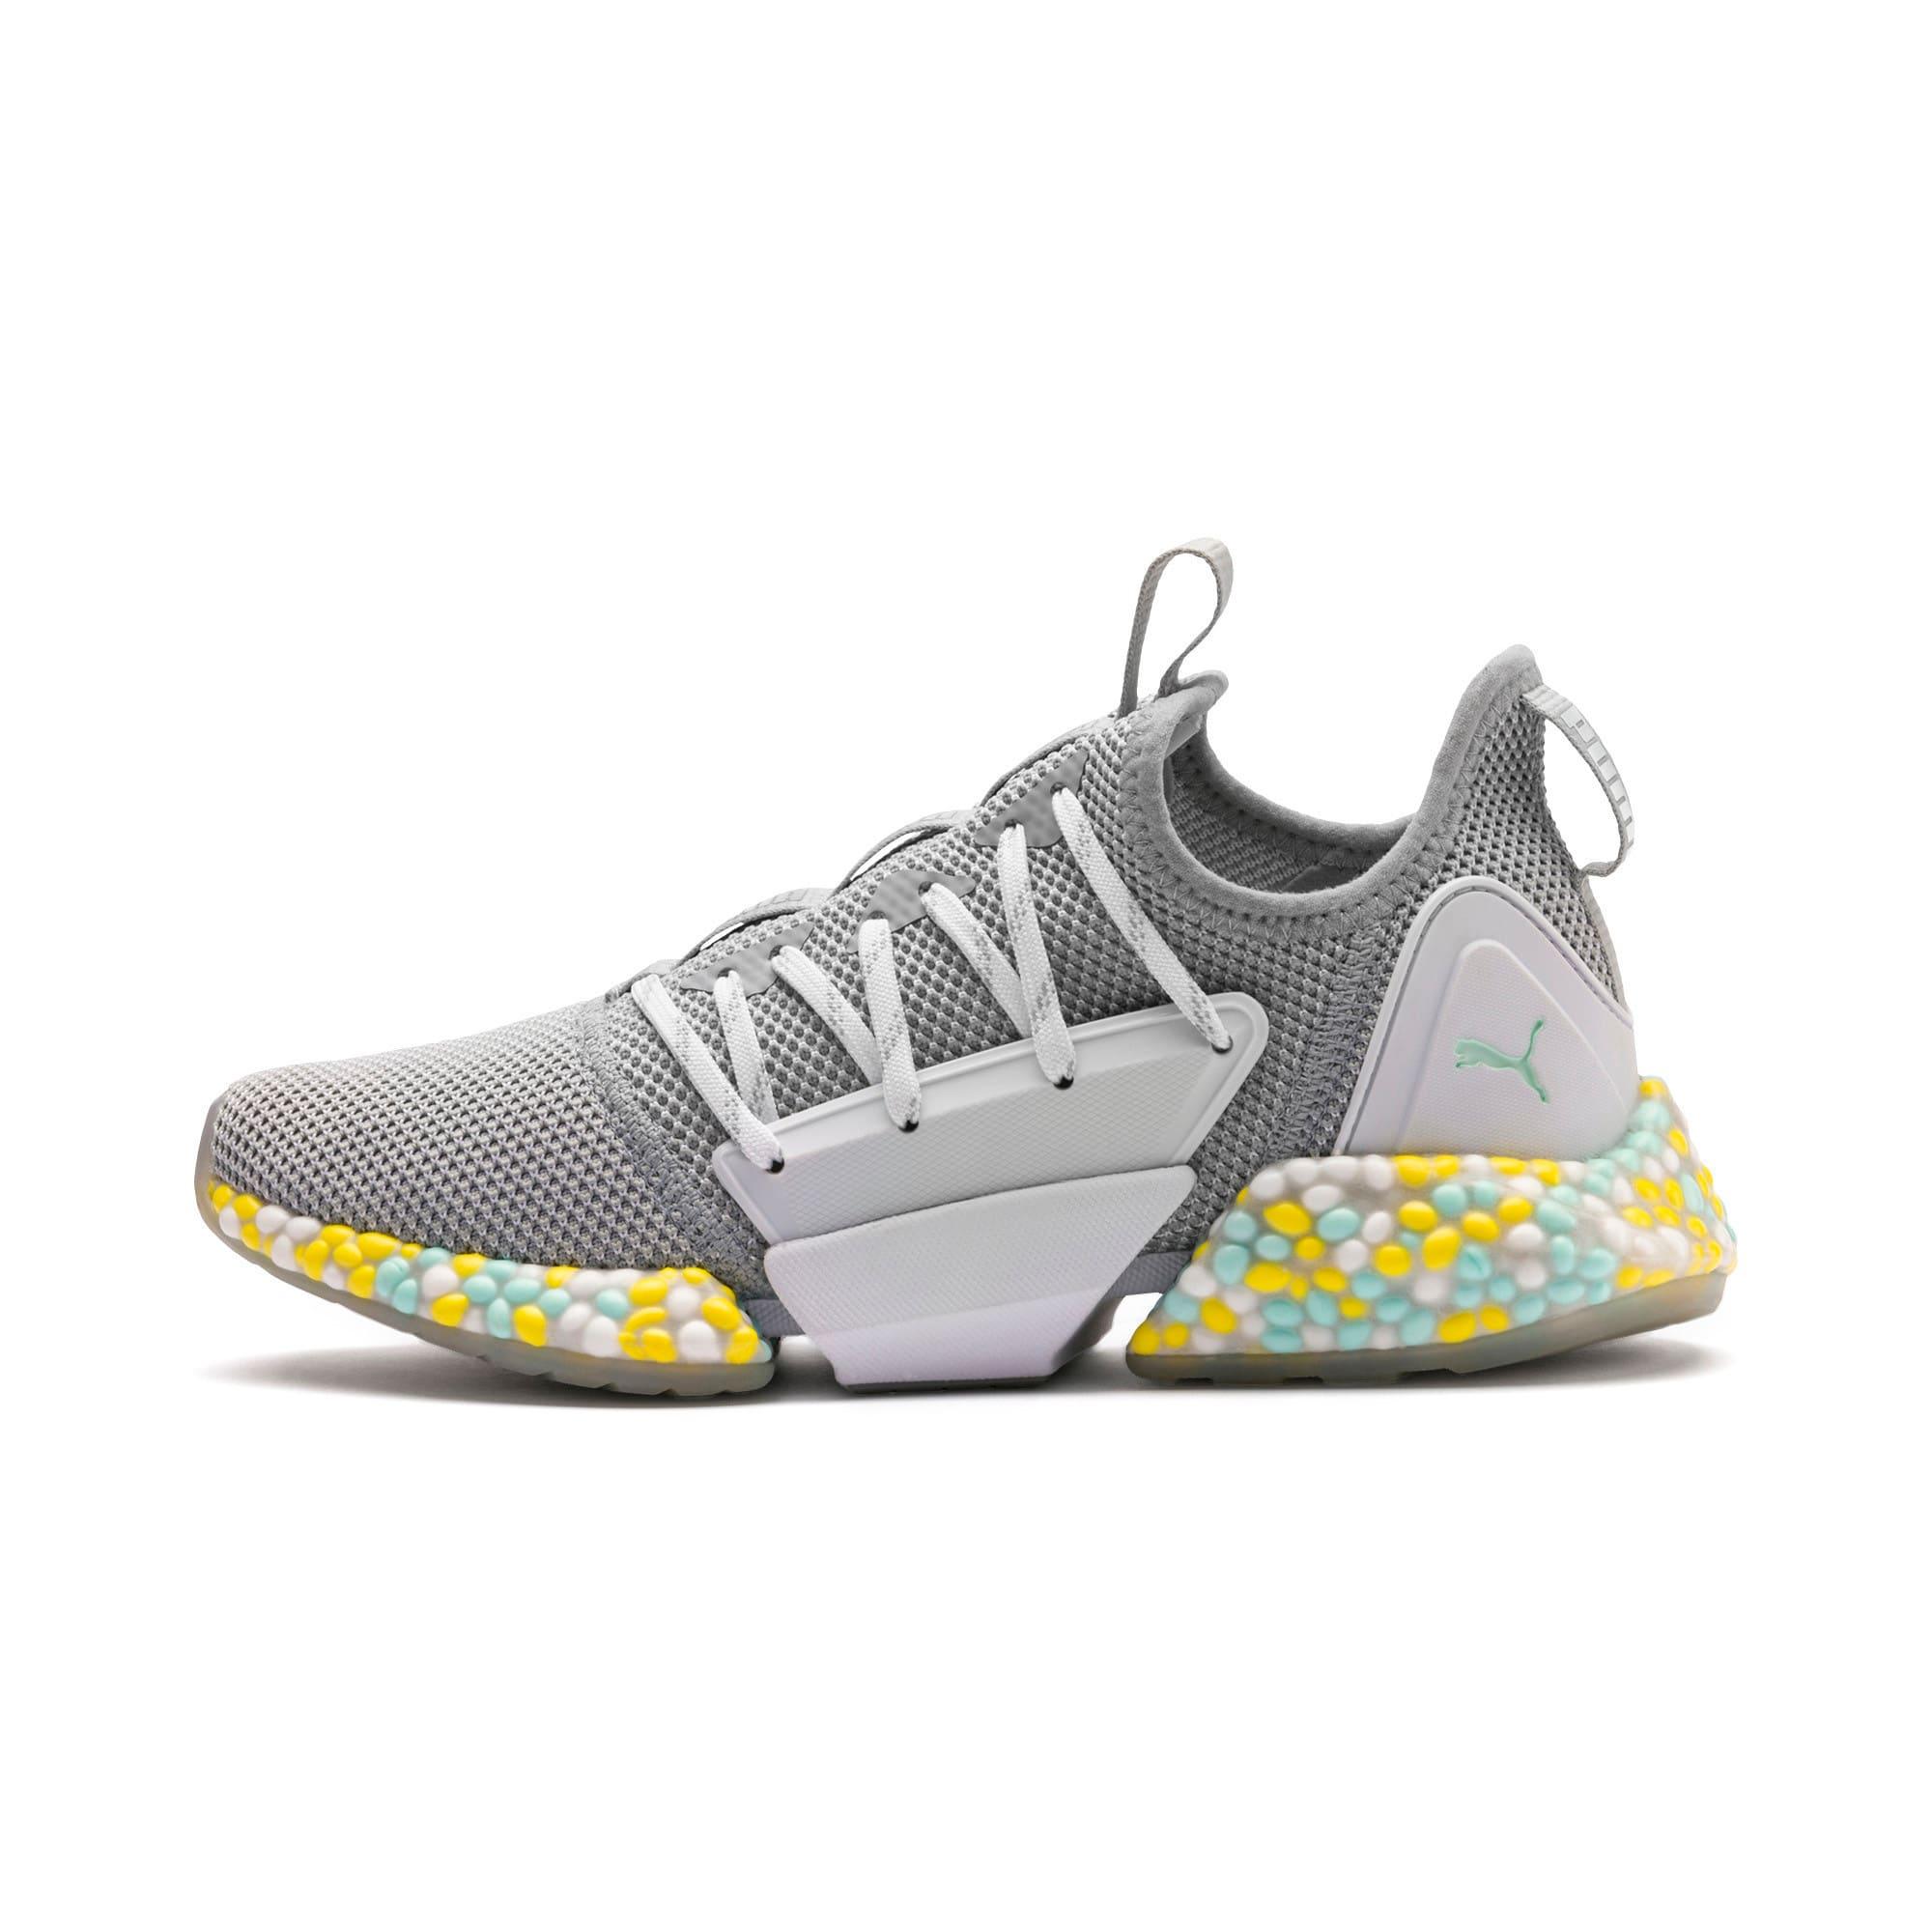 Thumbnail 1 of Hybrid Rocket Women's Running Shoes, Quarry-Puma White-Fair Aqua, medium-IND